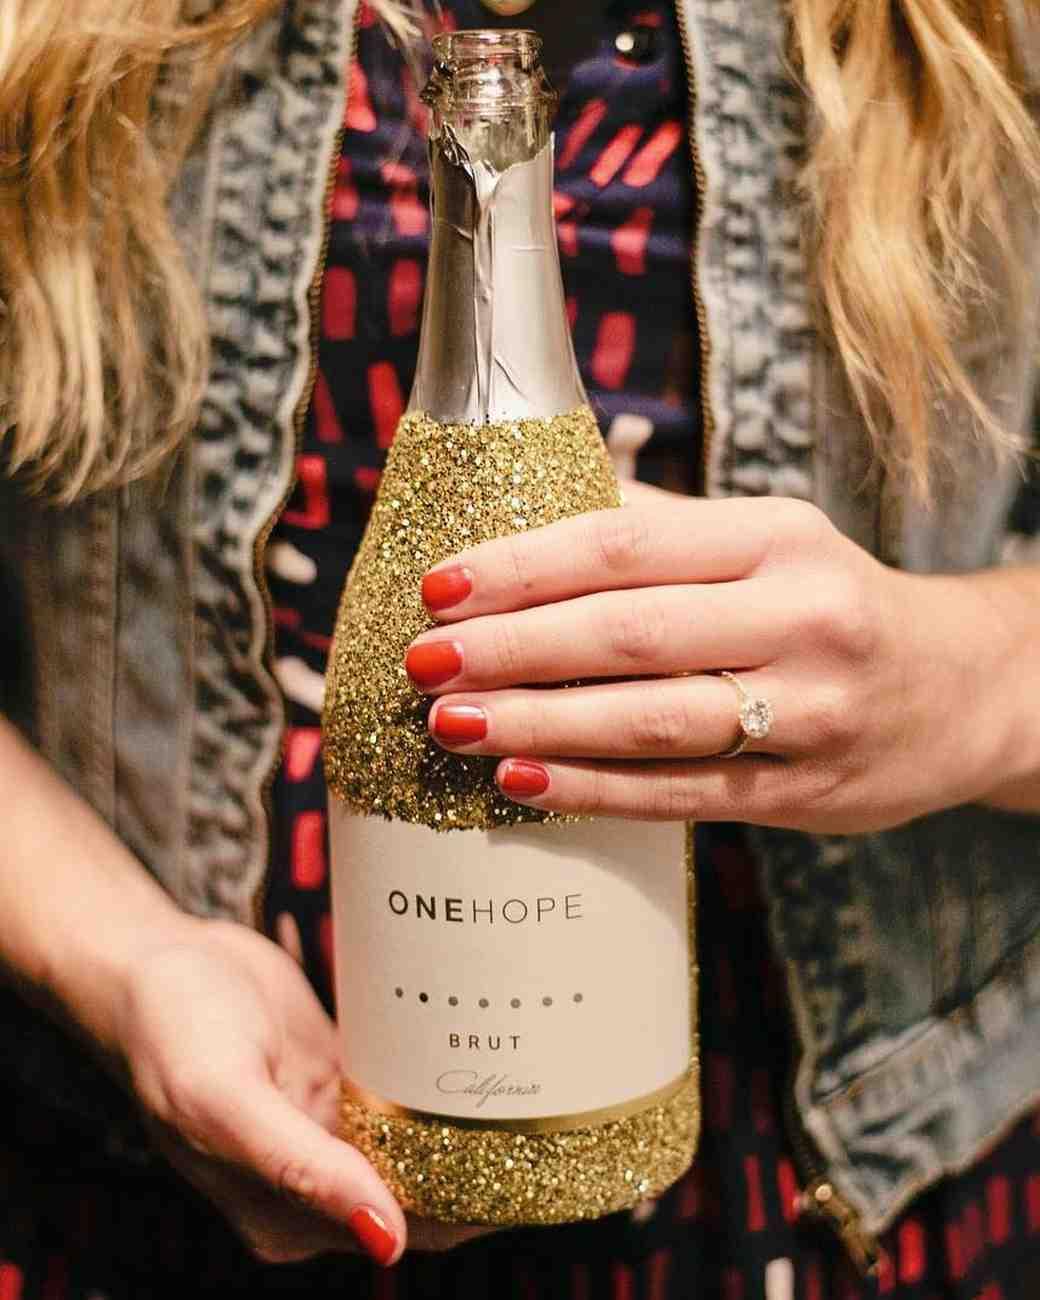 engagement-ring-selfies-champagne-0216.jpg